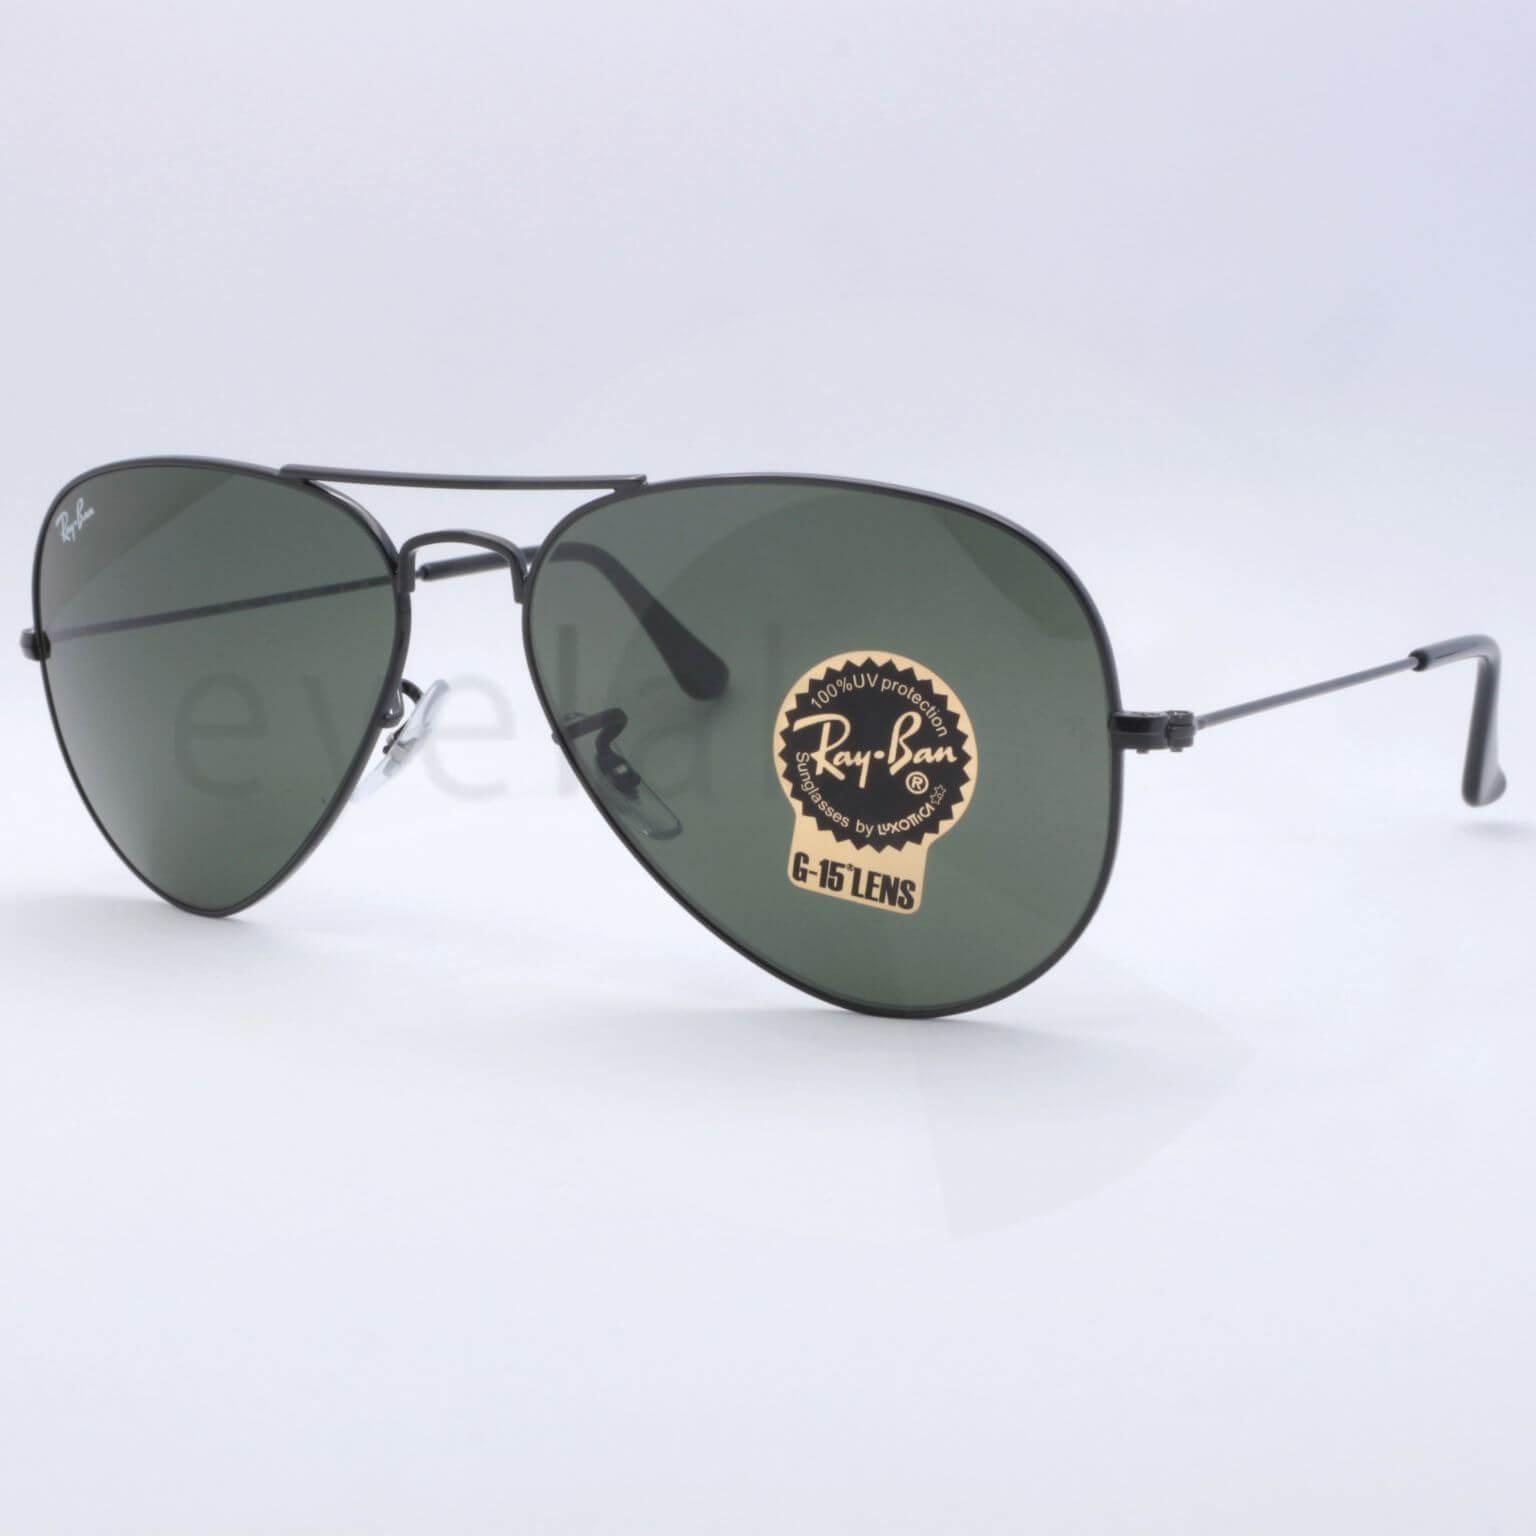 7cb20e671e Ray-Ban Aviator sunglasses 3025 L2823 58 ~ Οπτικά Eyelab